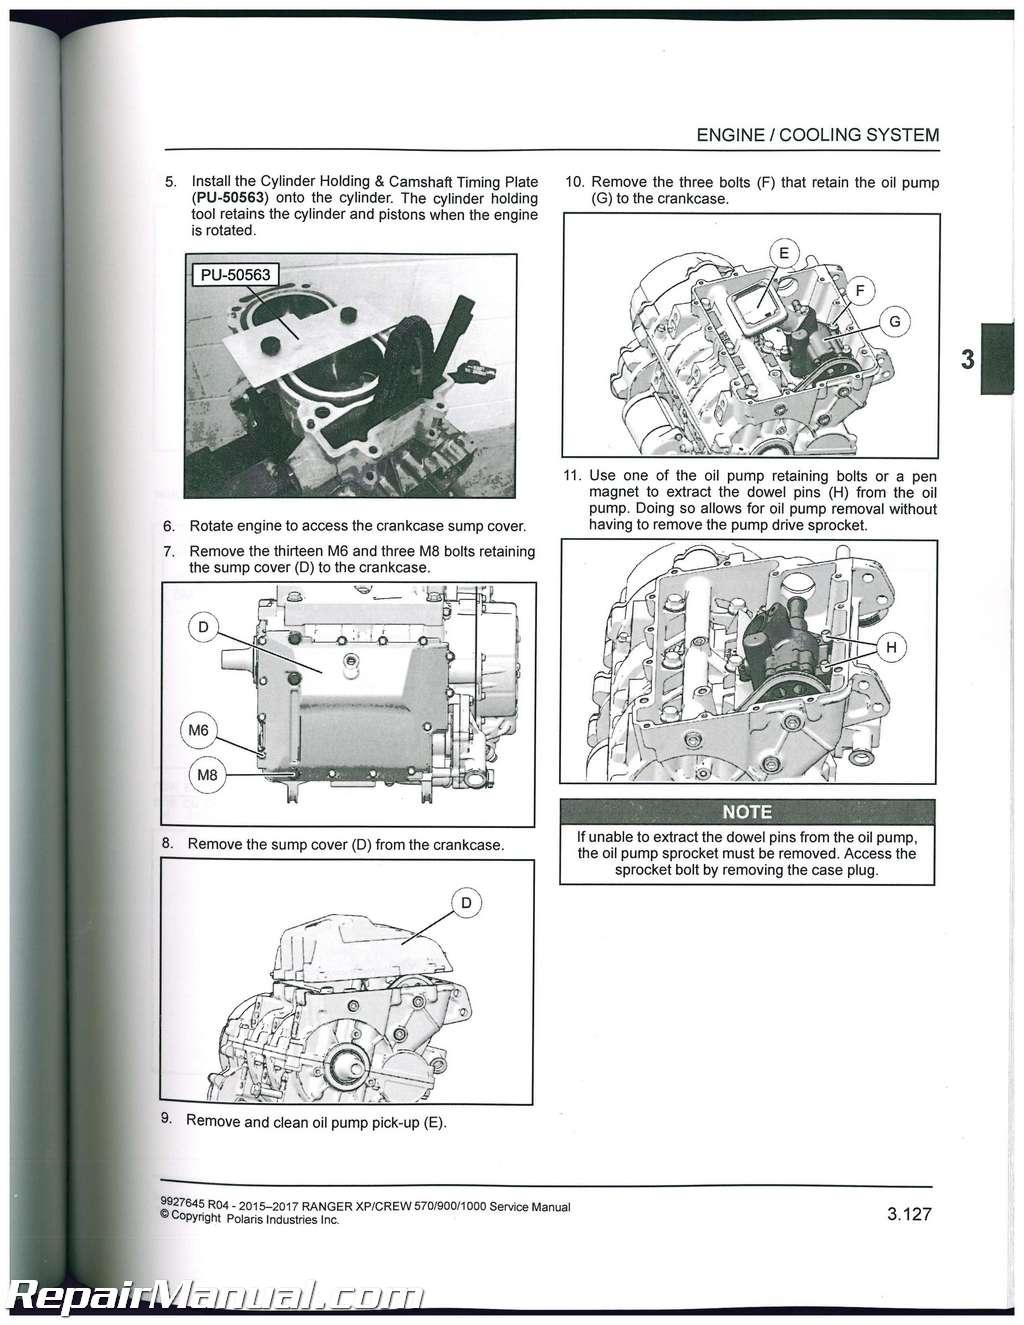 2011 Polaris Ranger Diesel Wiring Diagram Disc Drivers Windows Pdf Book Library Summary Ebook 3438mb Epub Looking For